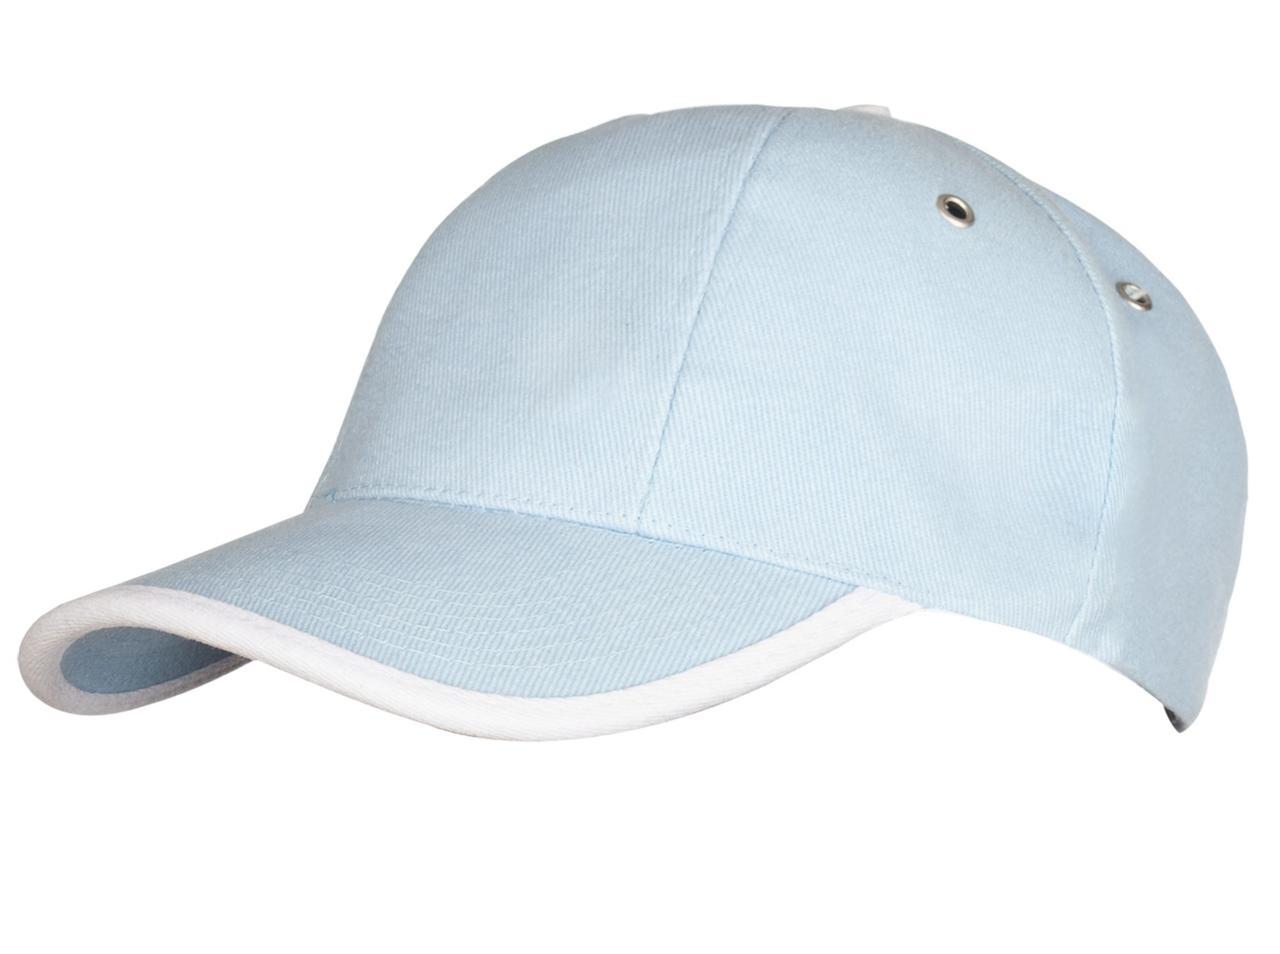 Бейсболка Unit Trendy, голубая с белым (артикул 1849.14)